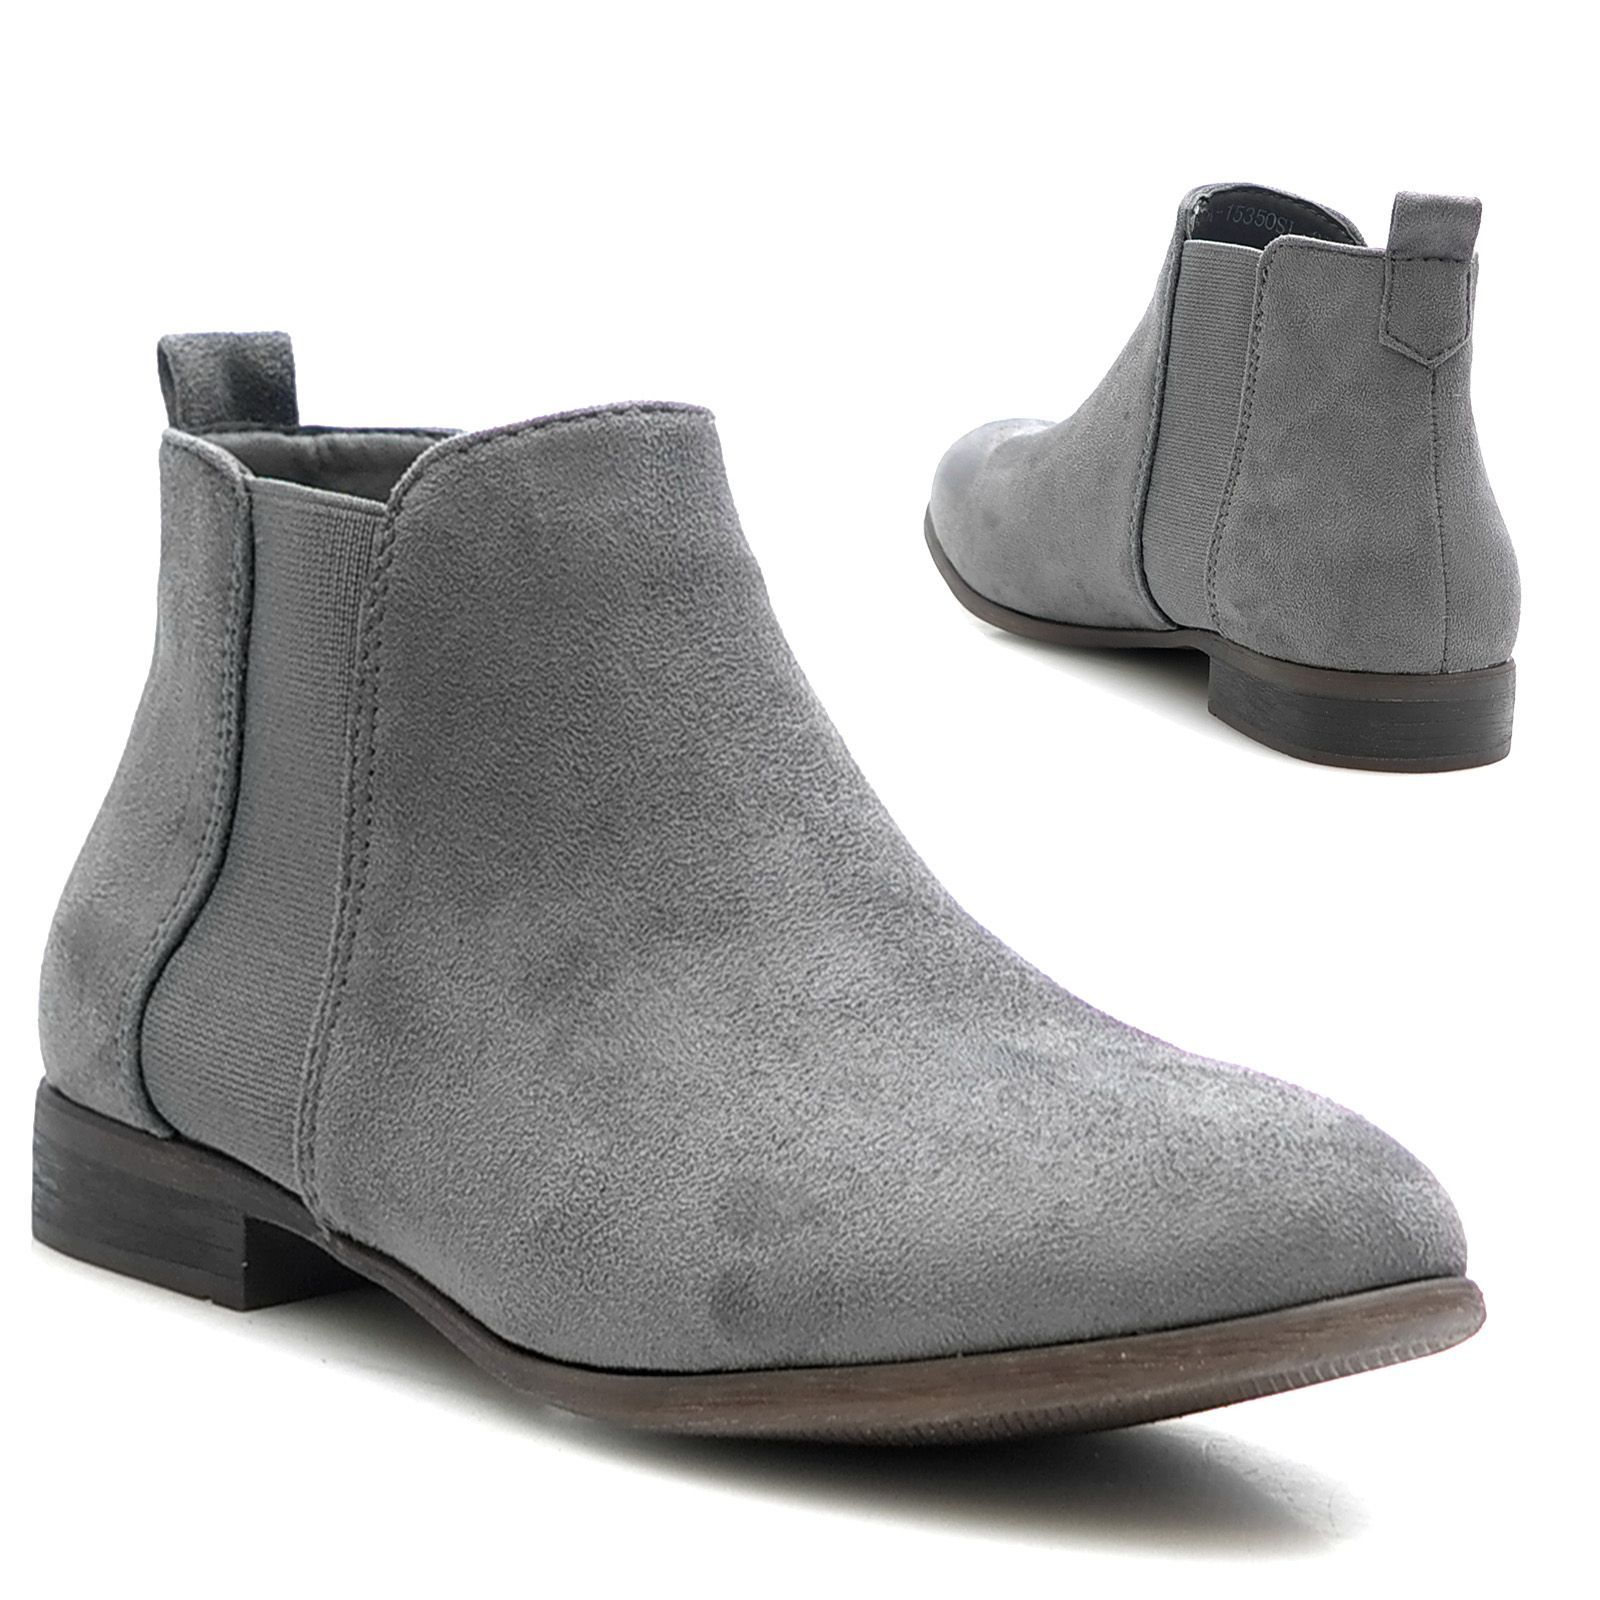 schuhe stiefel stiefeletten ankle boots gummizug chelsea bootie shoes 41 42